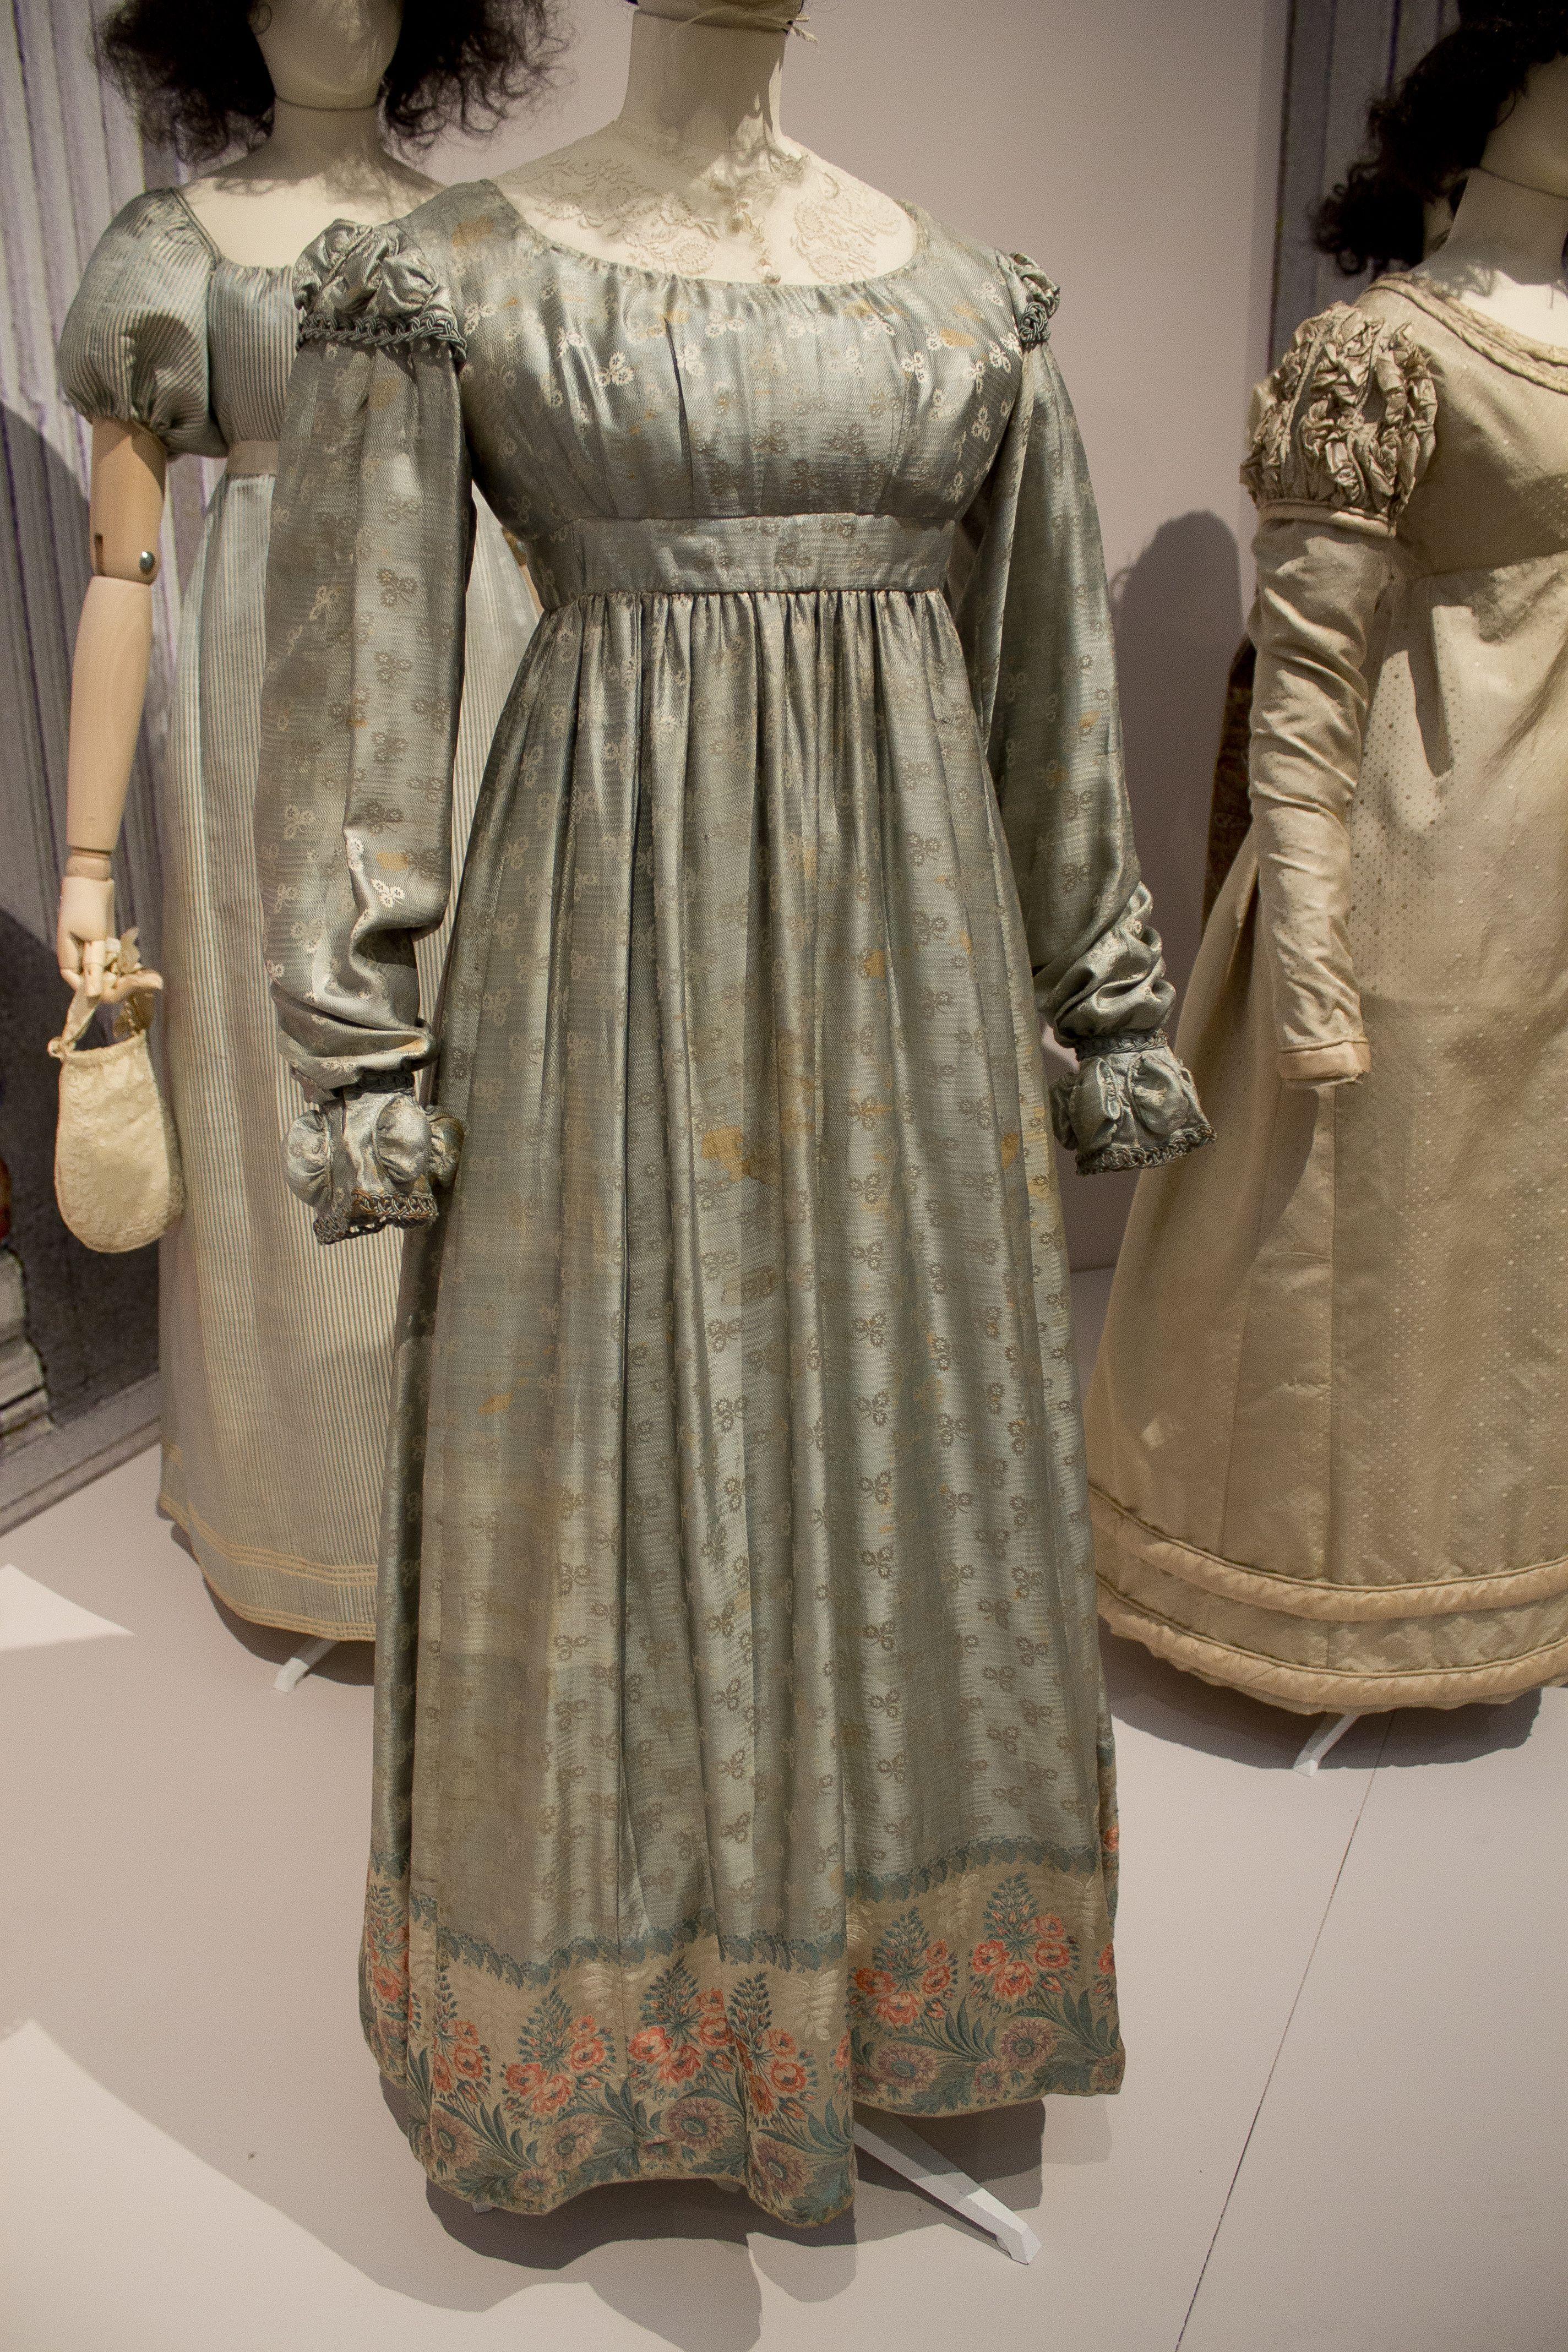 Gemeentemuseum the Hague exhibition on 10th century fashion